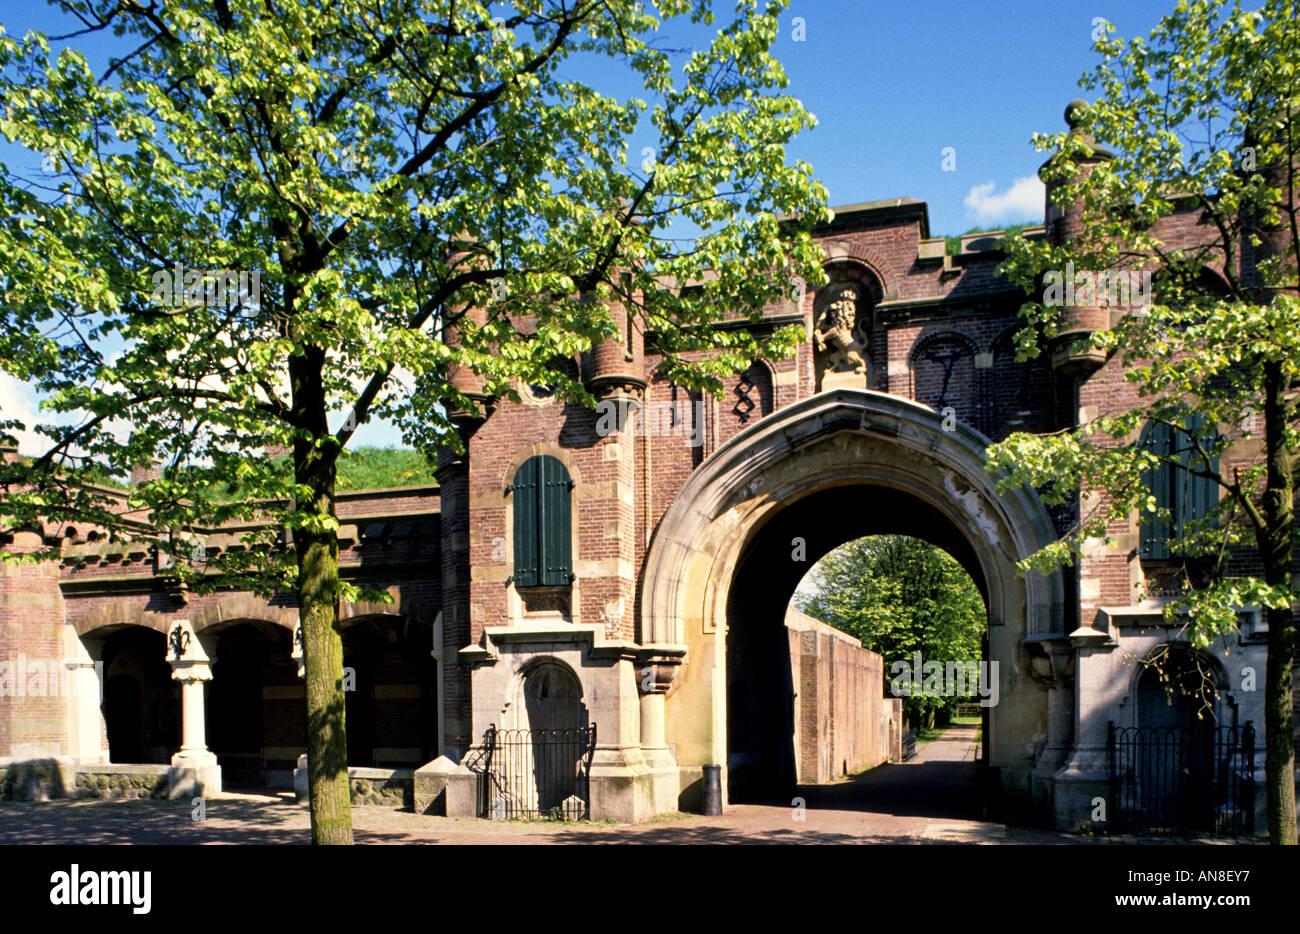 Gate In Naarden Vesting North Holland - Stock Image